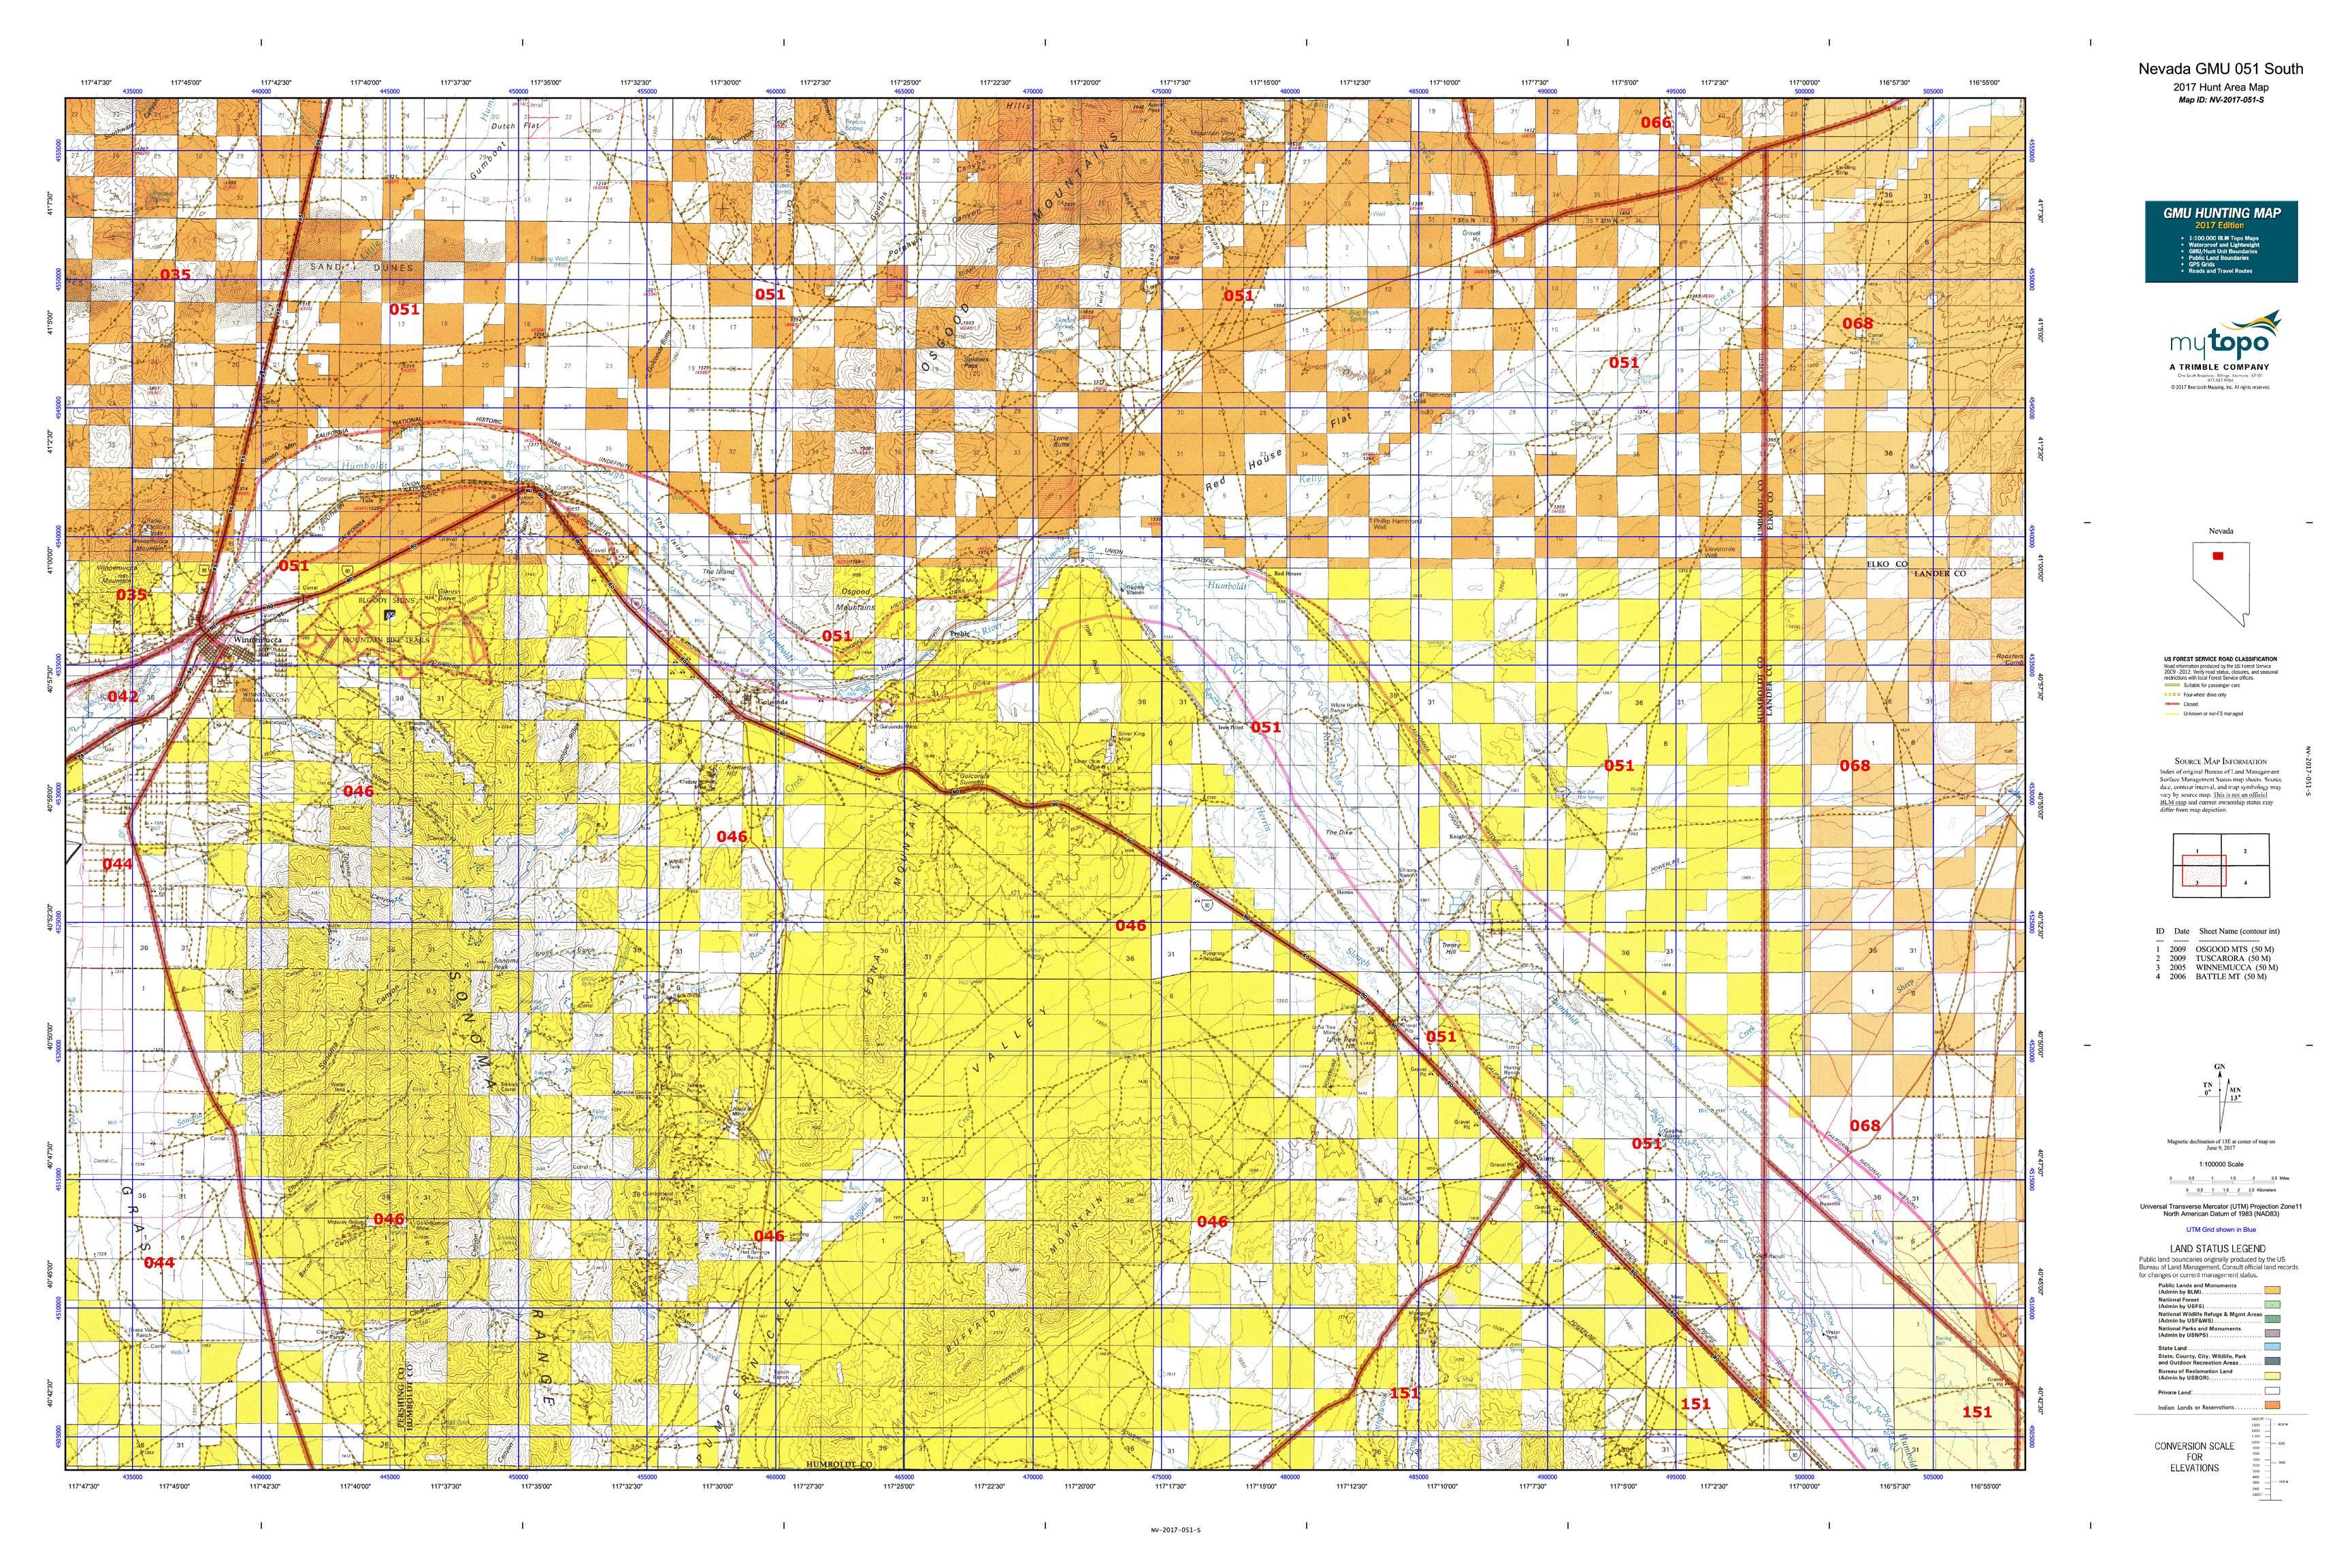 Nevada GMU North Map MyTopo - Nevada map